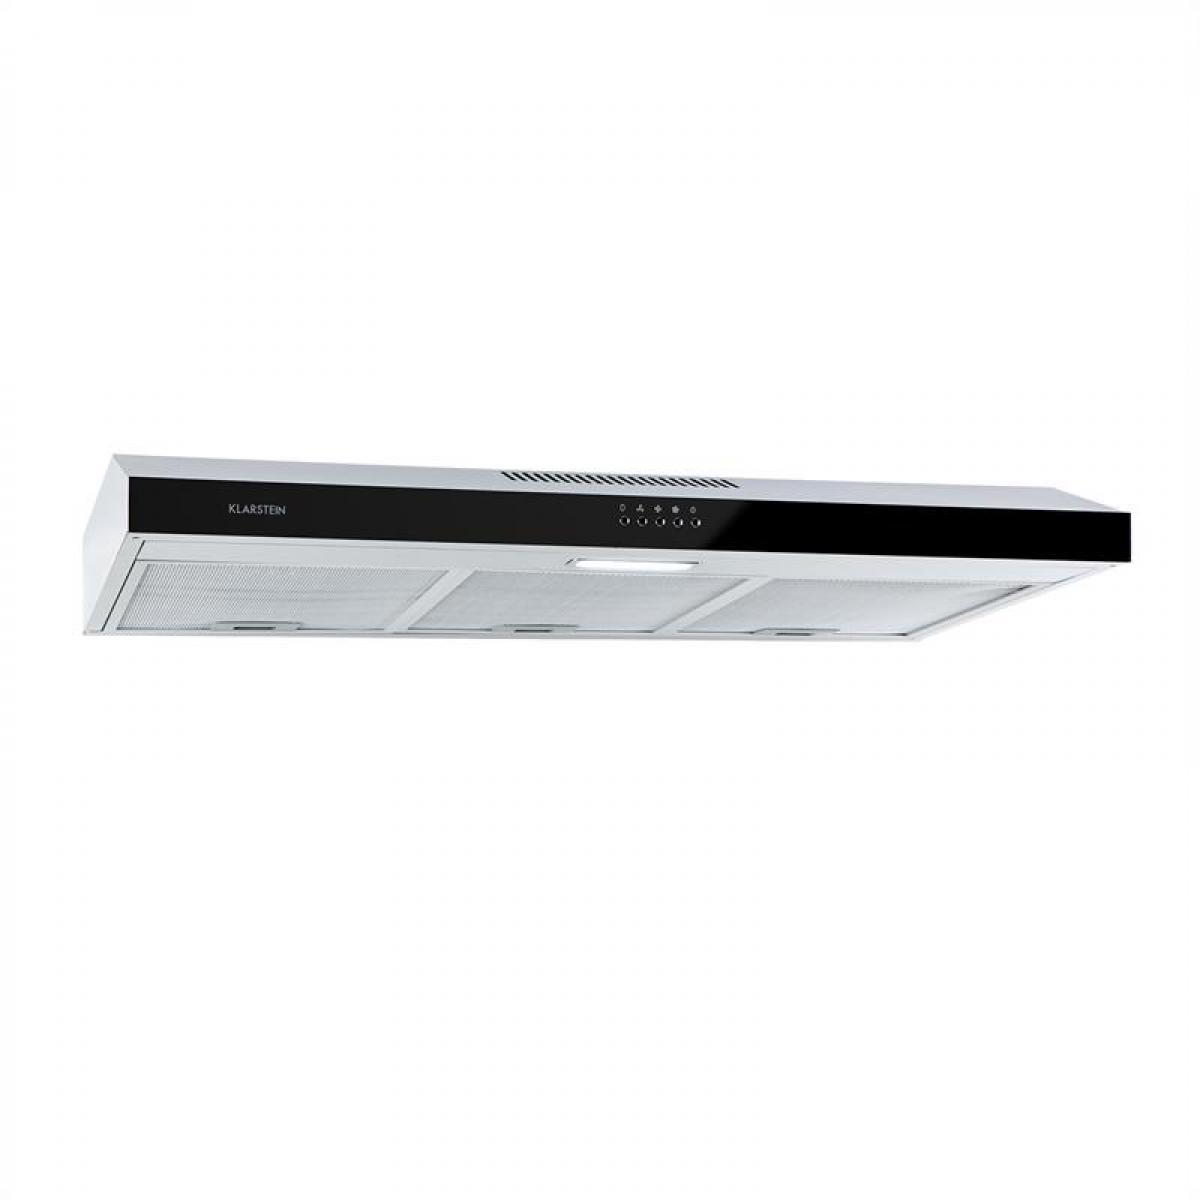 Klarstein klarstein Contempo Hotte aspirante 90 175m³ / h LED inox acrylique noir Klarstein